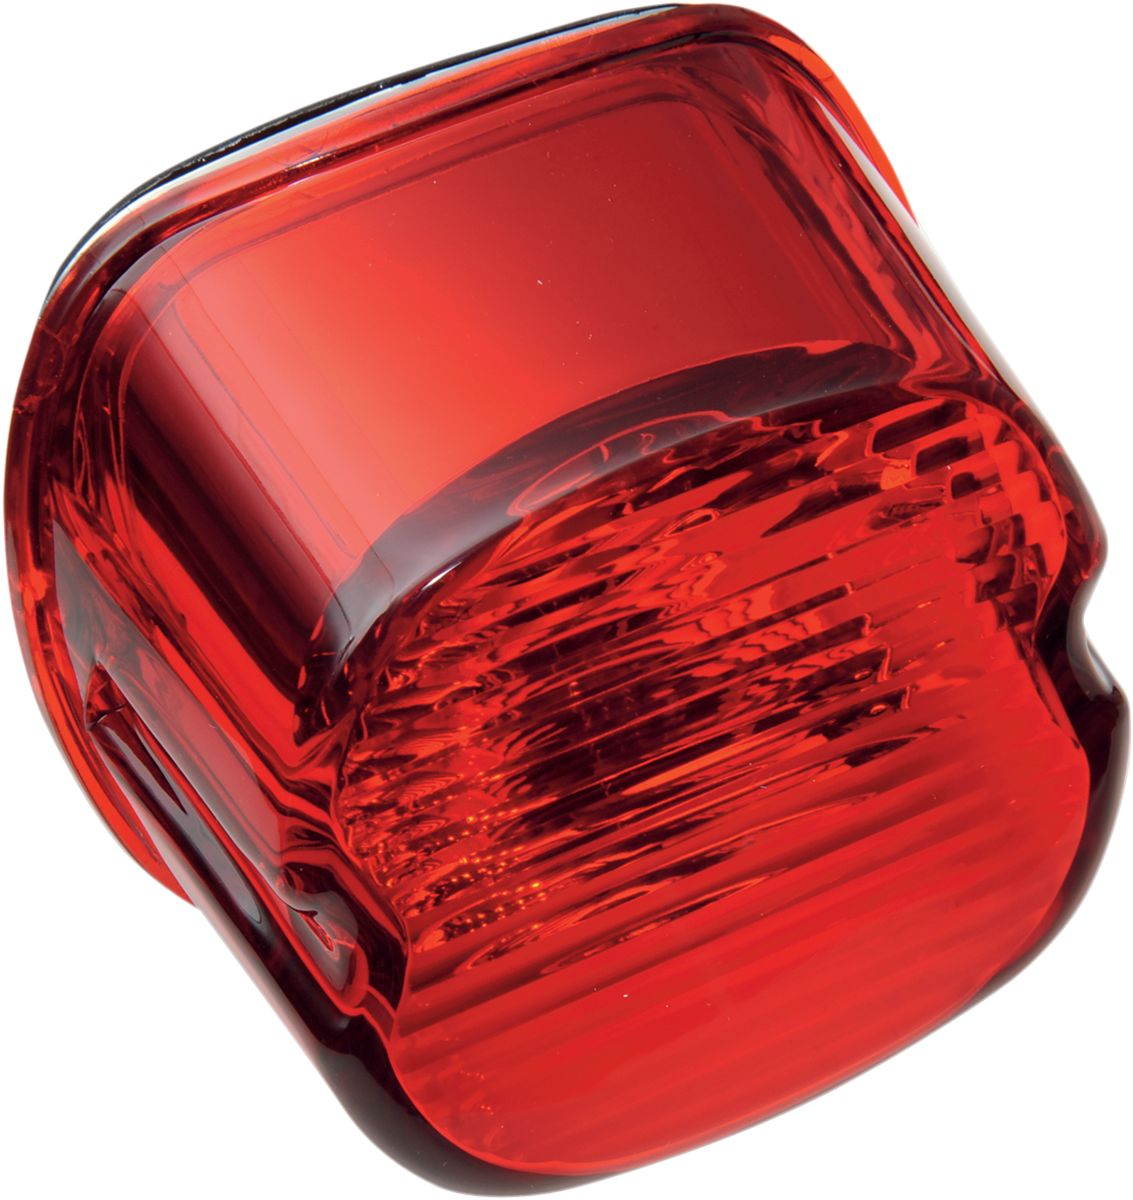 【Drag Specialties】尾燈燈殼/ 紅色 NO TAG 1999-03 【LENS T/L RED NO TAG 99-03 [2010-0799]】 - 「Webike-摩托百貨」